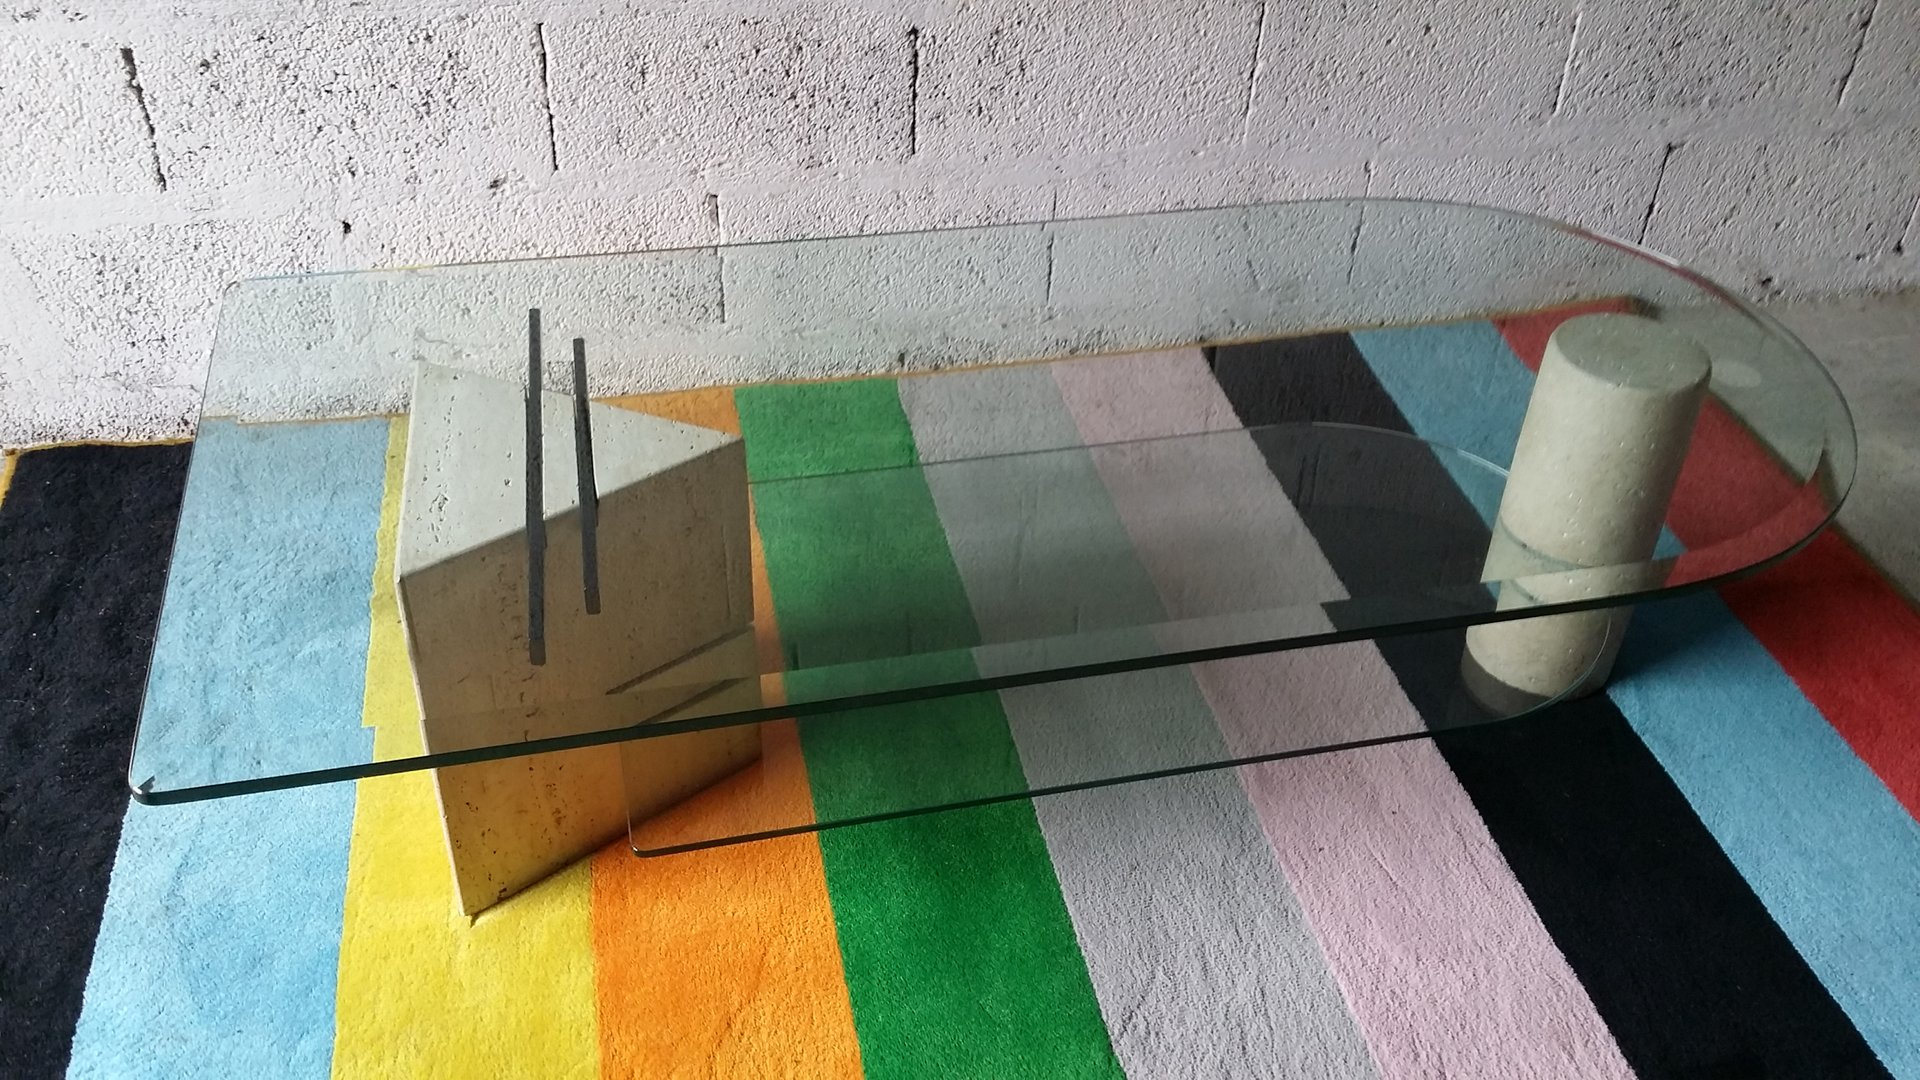 Vintage roche bobois glass travertine coffee table for - Table marbre roche bobois ...